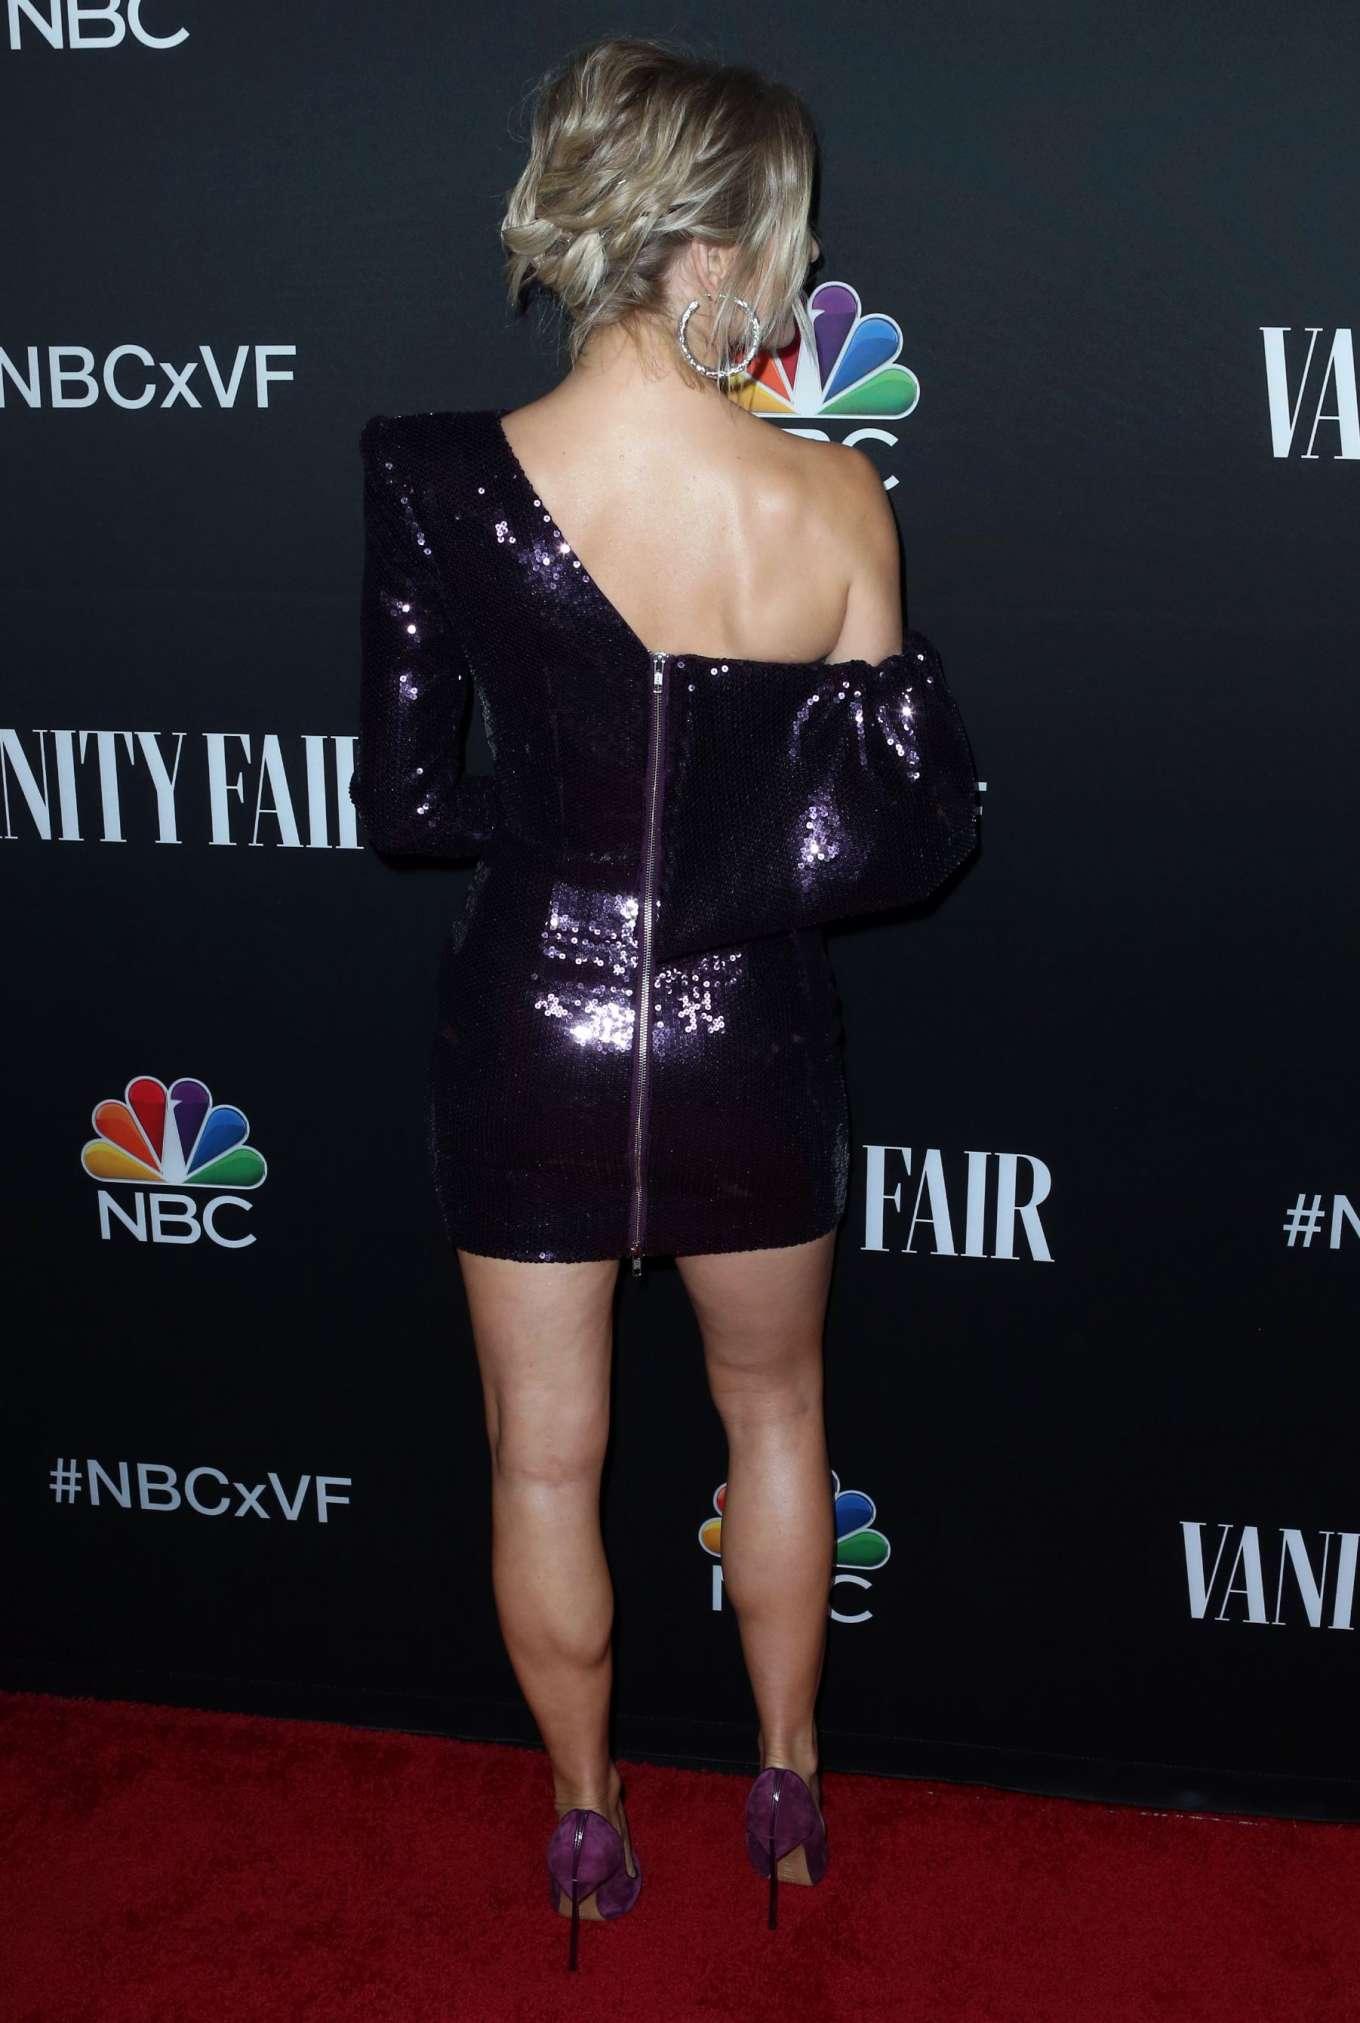 Julianne Hough 2019 : Julianne Hough – NBC and Vanity Fairs Celebration Of The Season-04